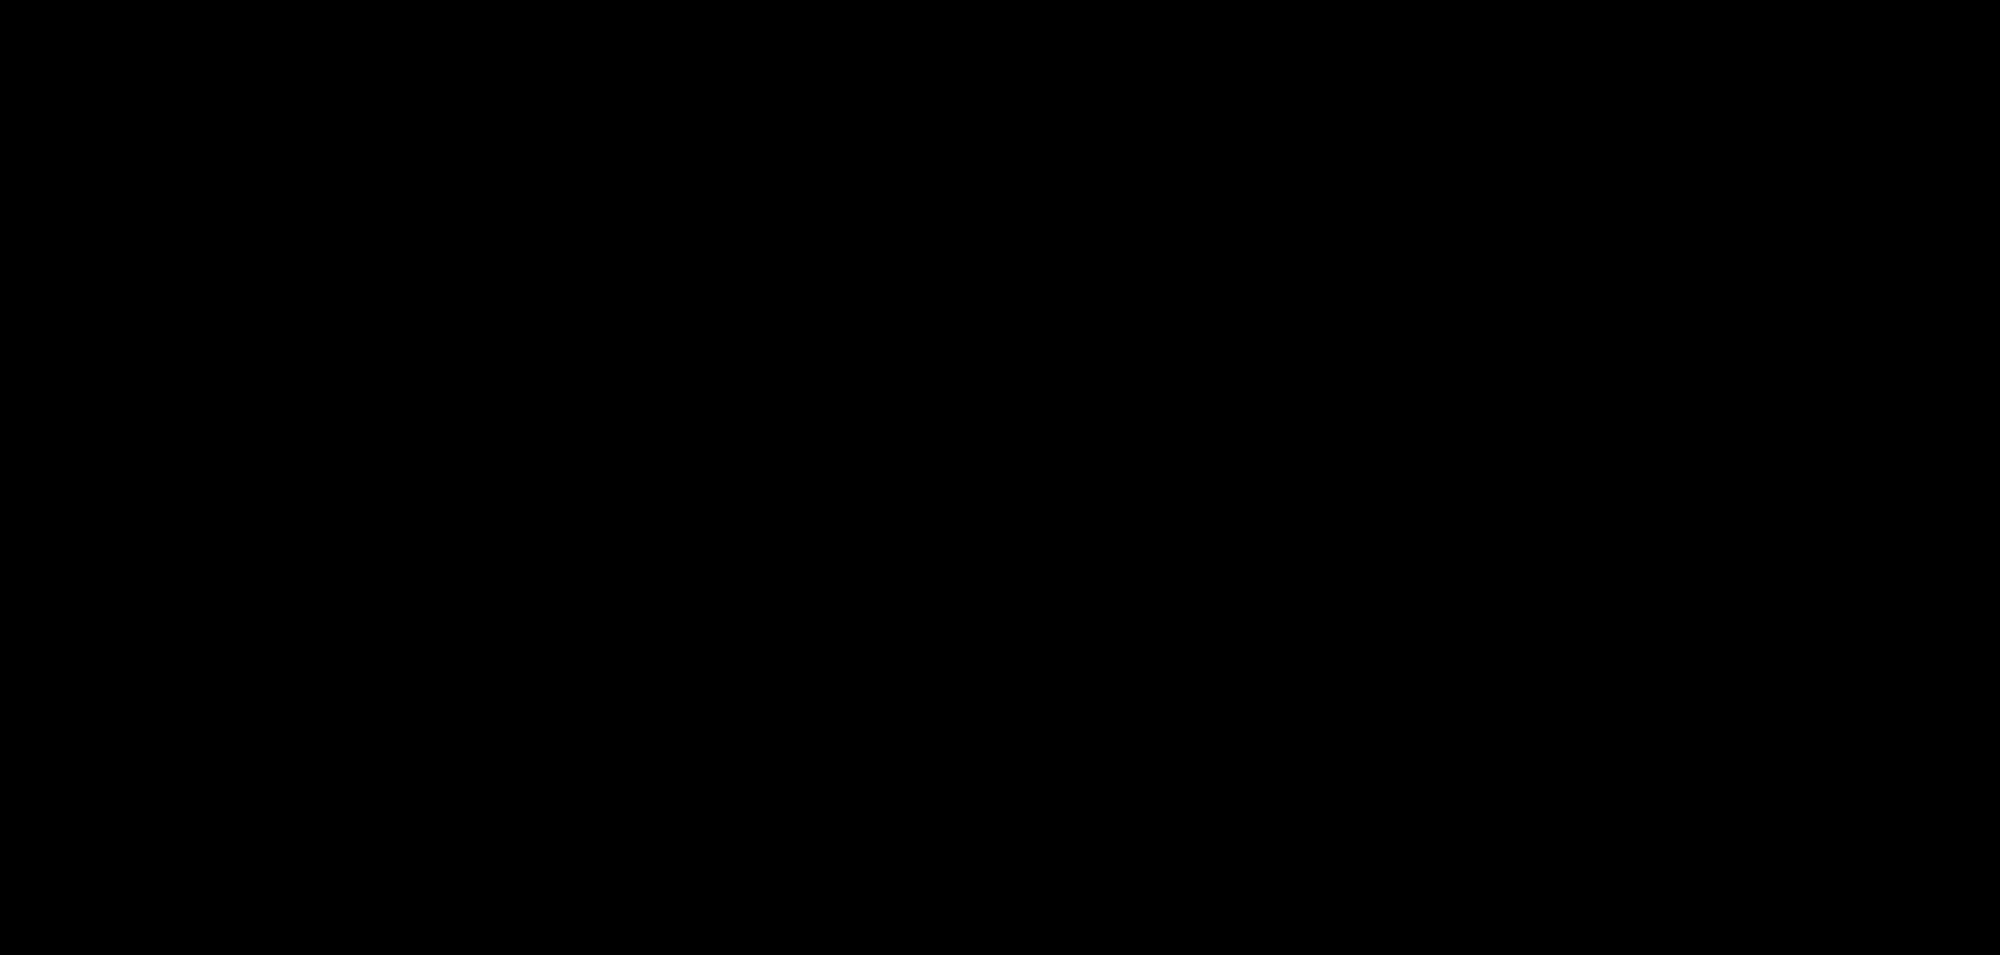 Website by Martin-logo-black (1).png